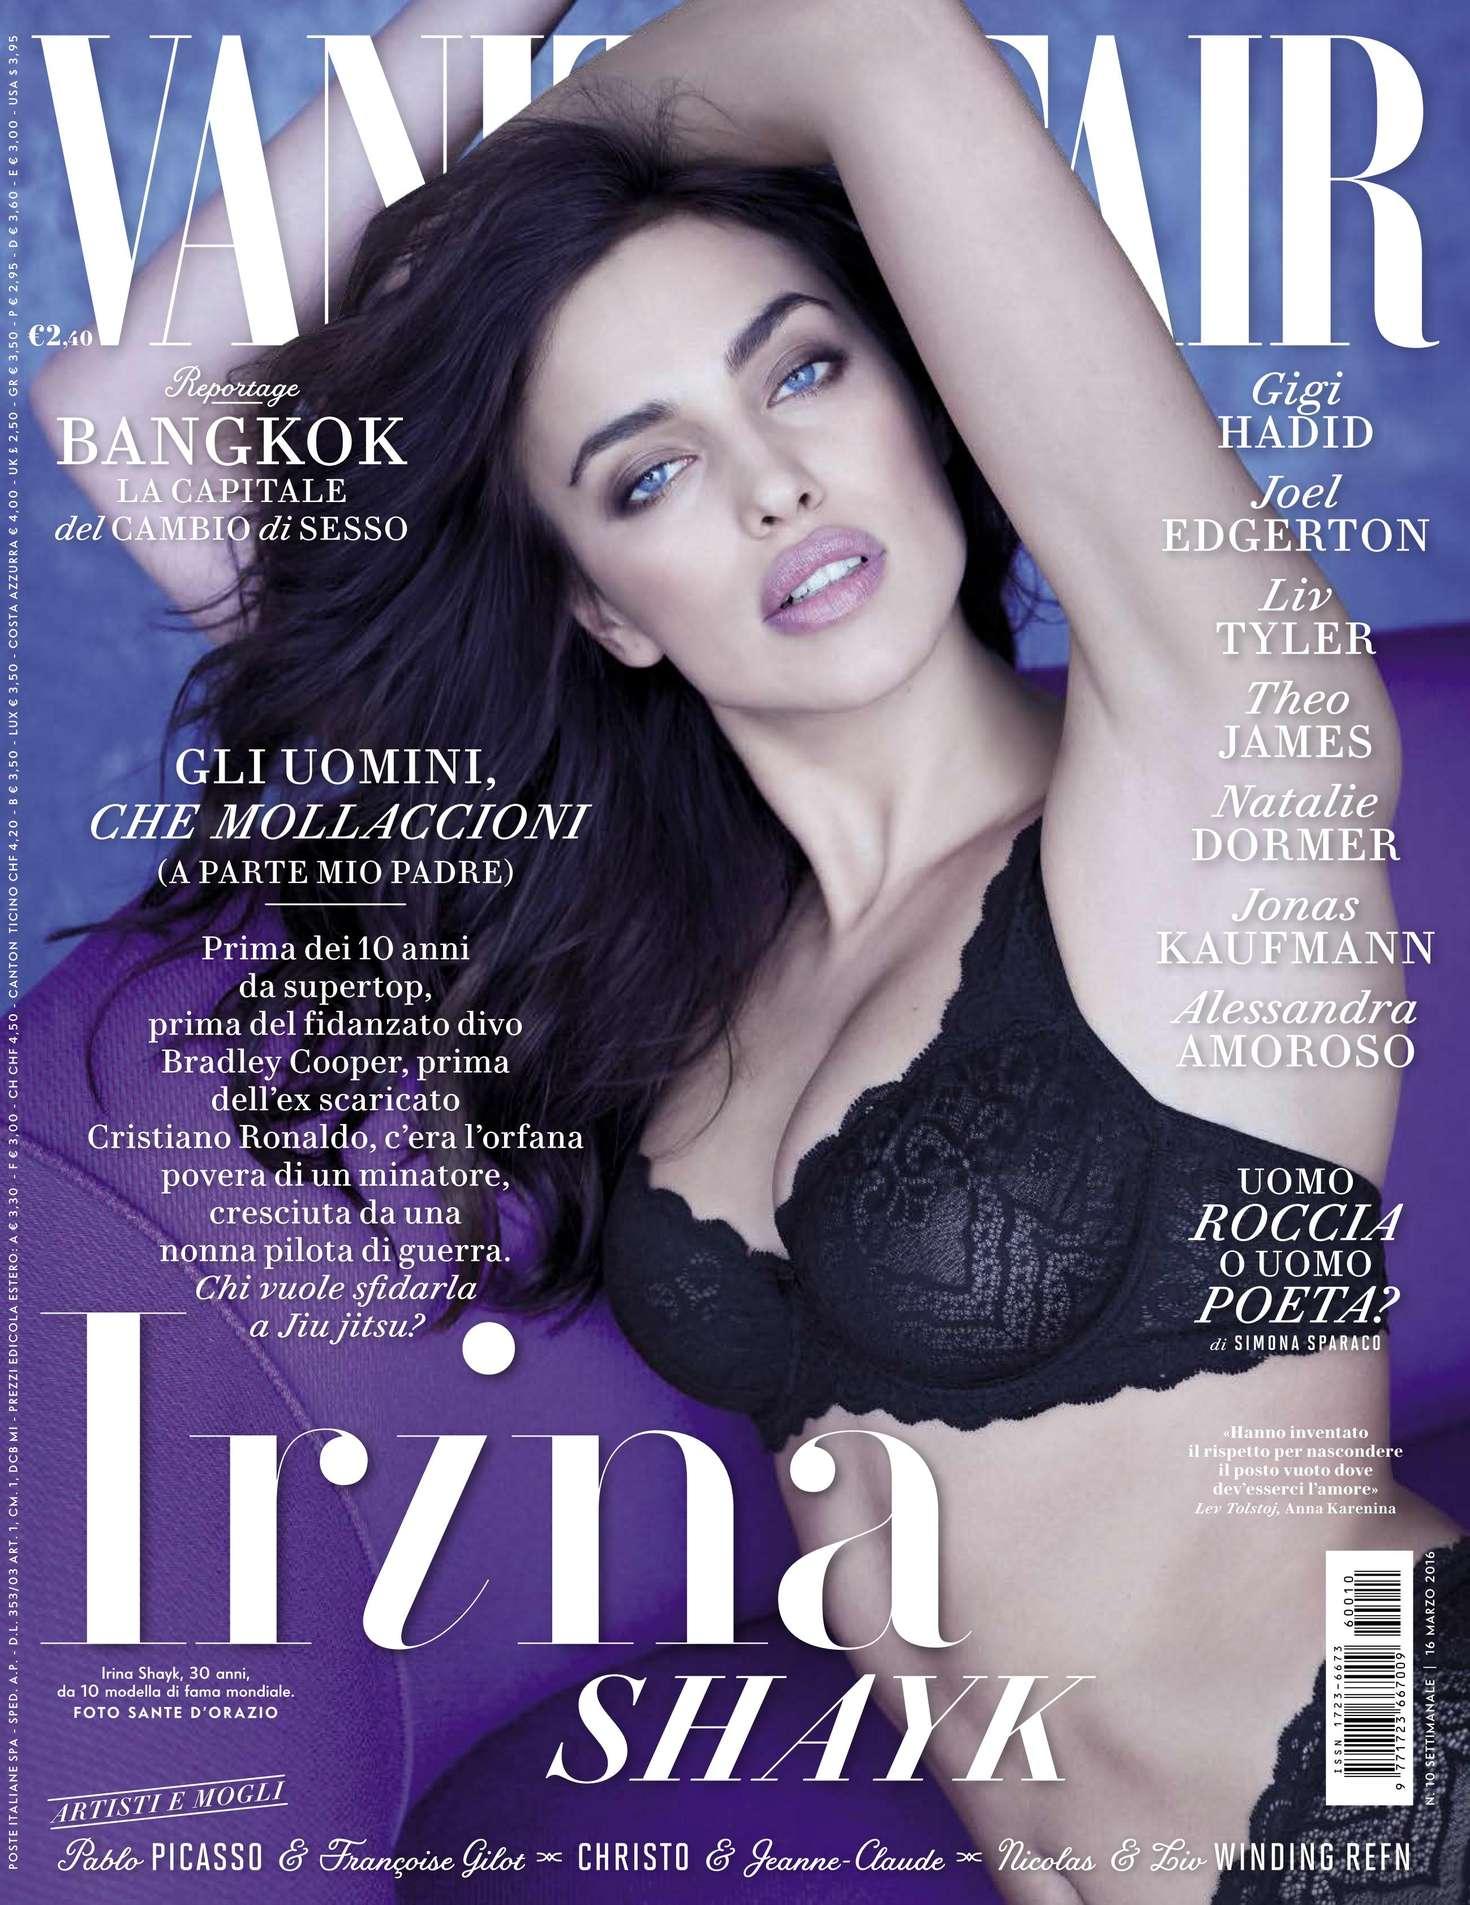 Sexy Pics Of Irina Shayk